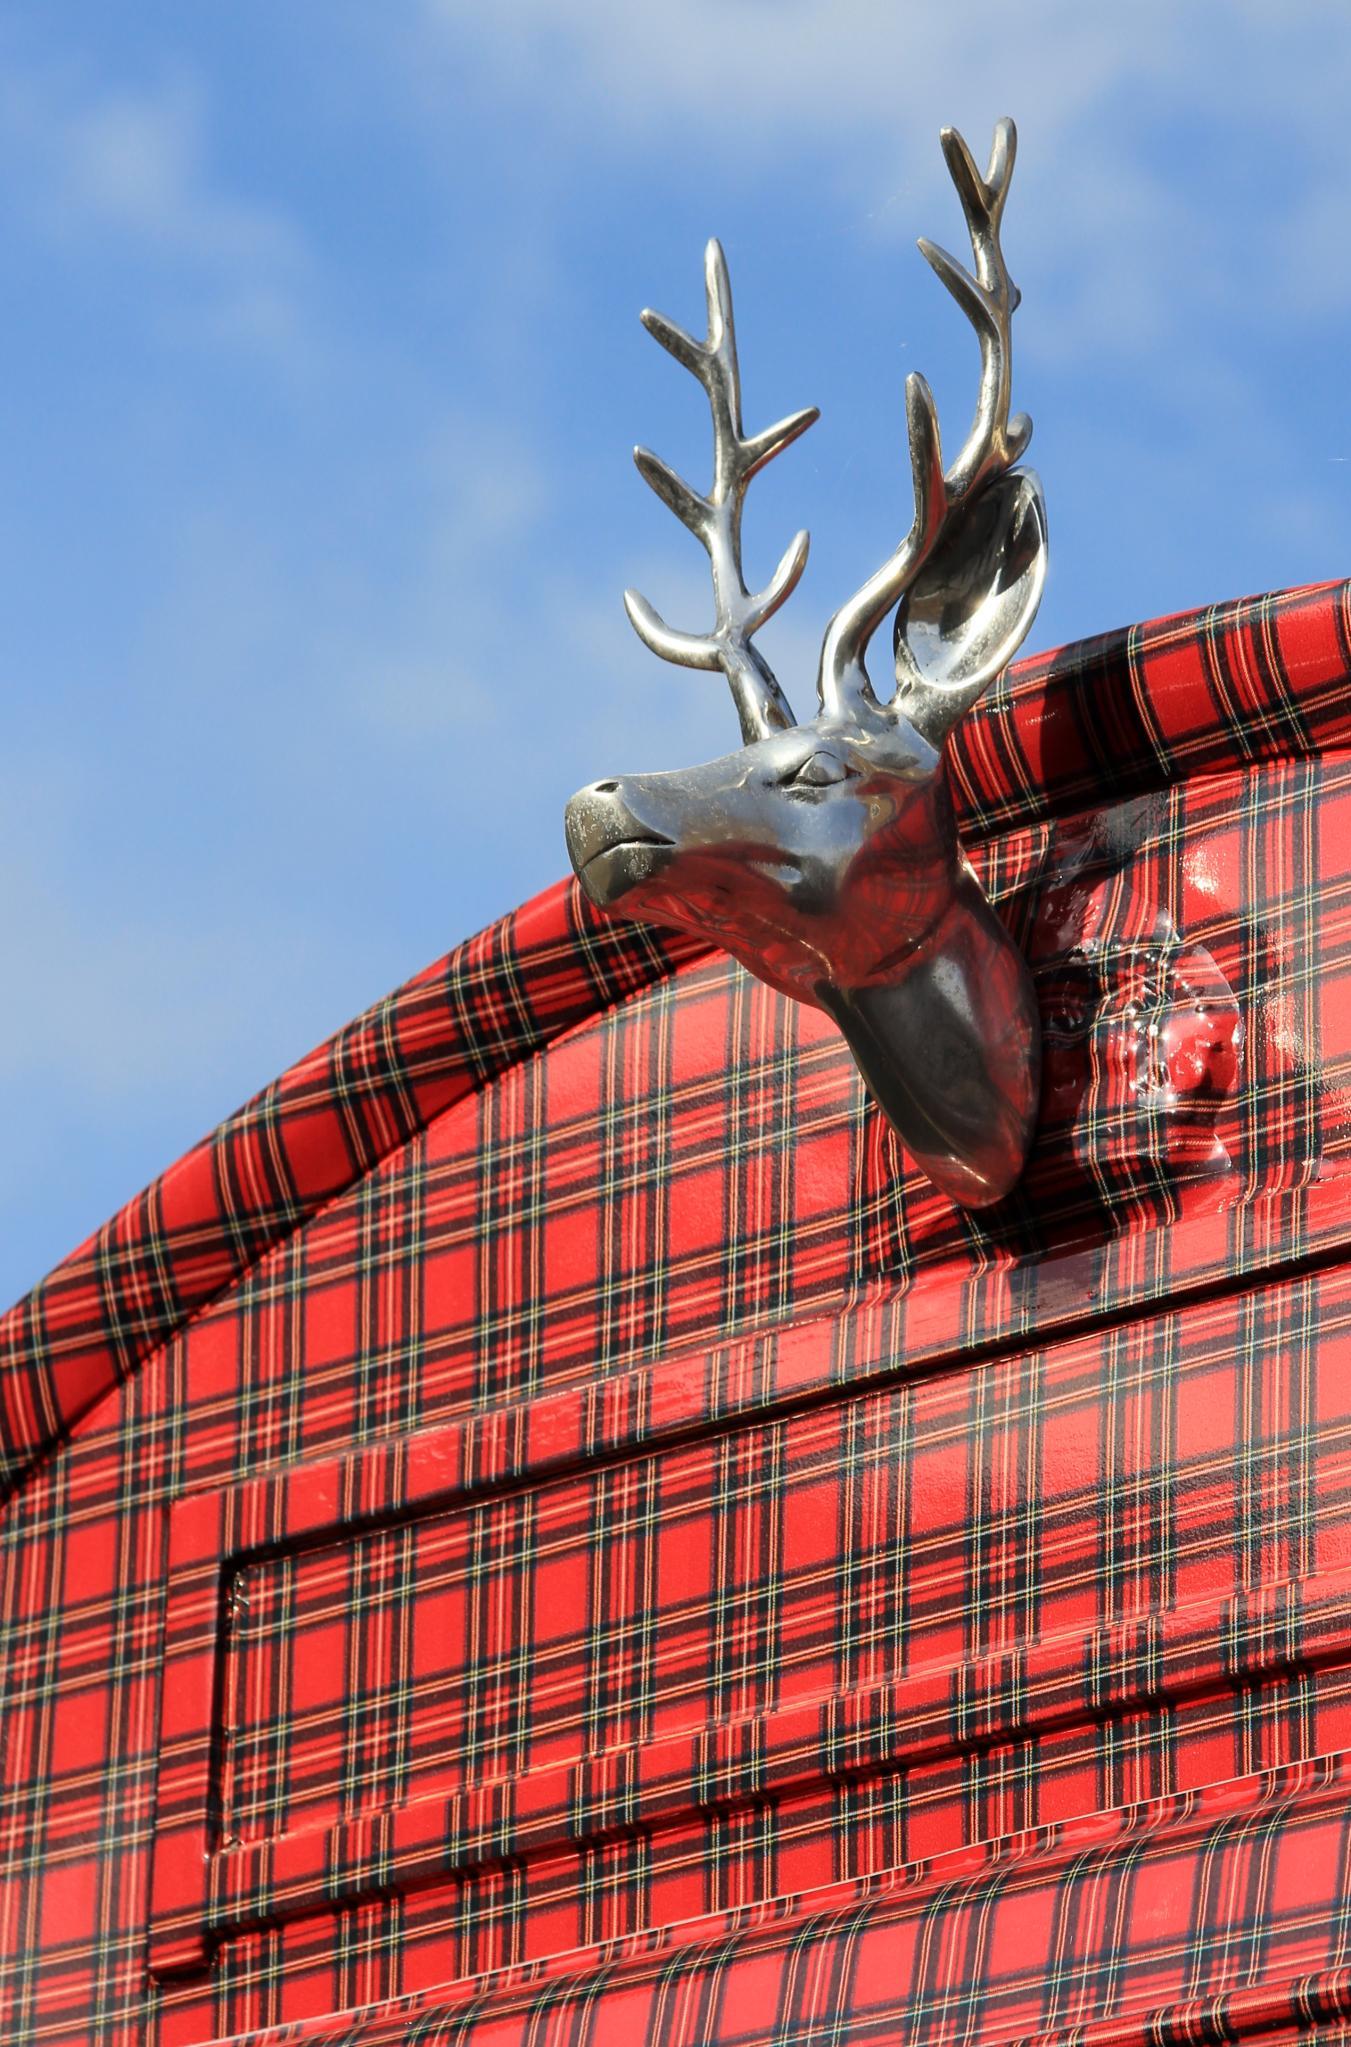 Royal Stewart -tartaanilla päällystetty postilaatikko Lontoossa. Kuva: Karen Roe, flickr.com, CC BY 2.0